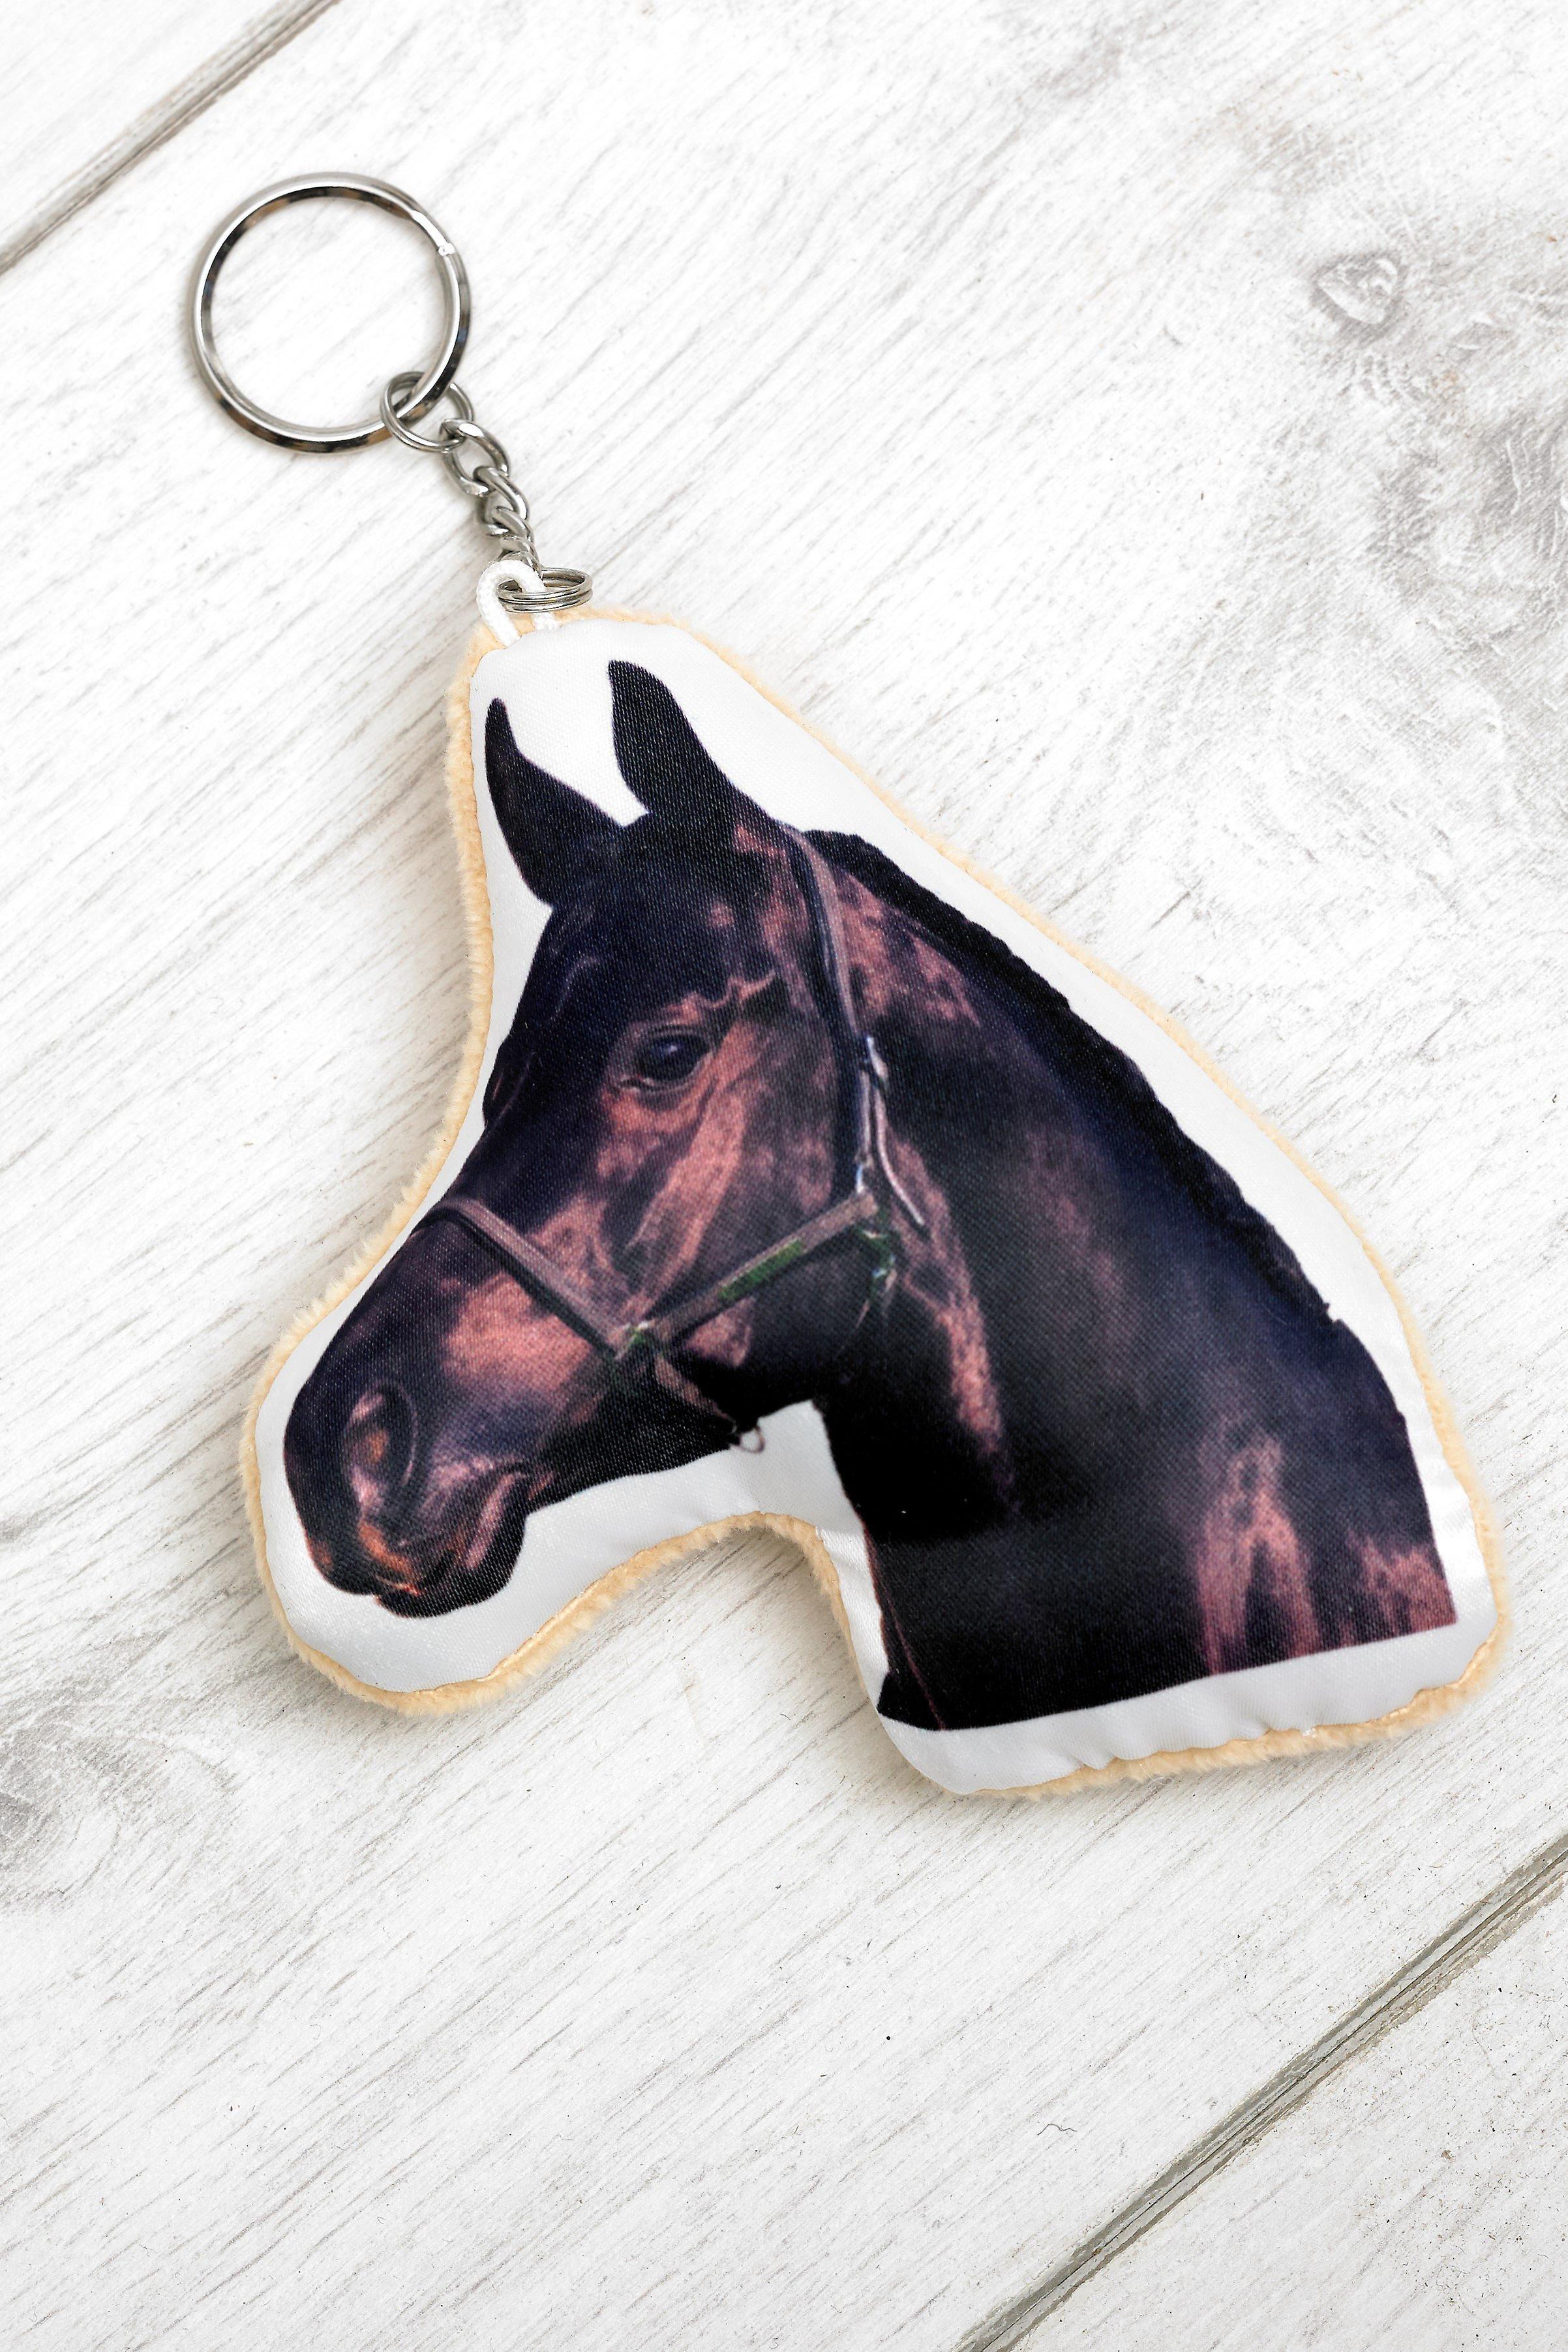 Adorable black horse keyring